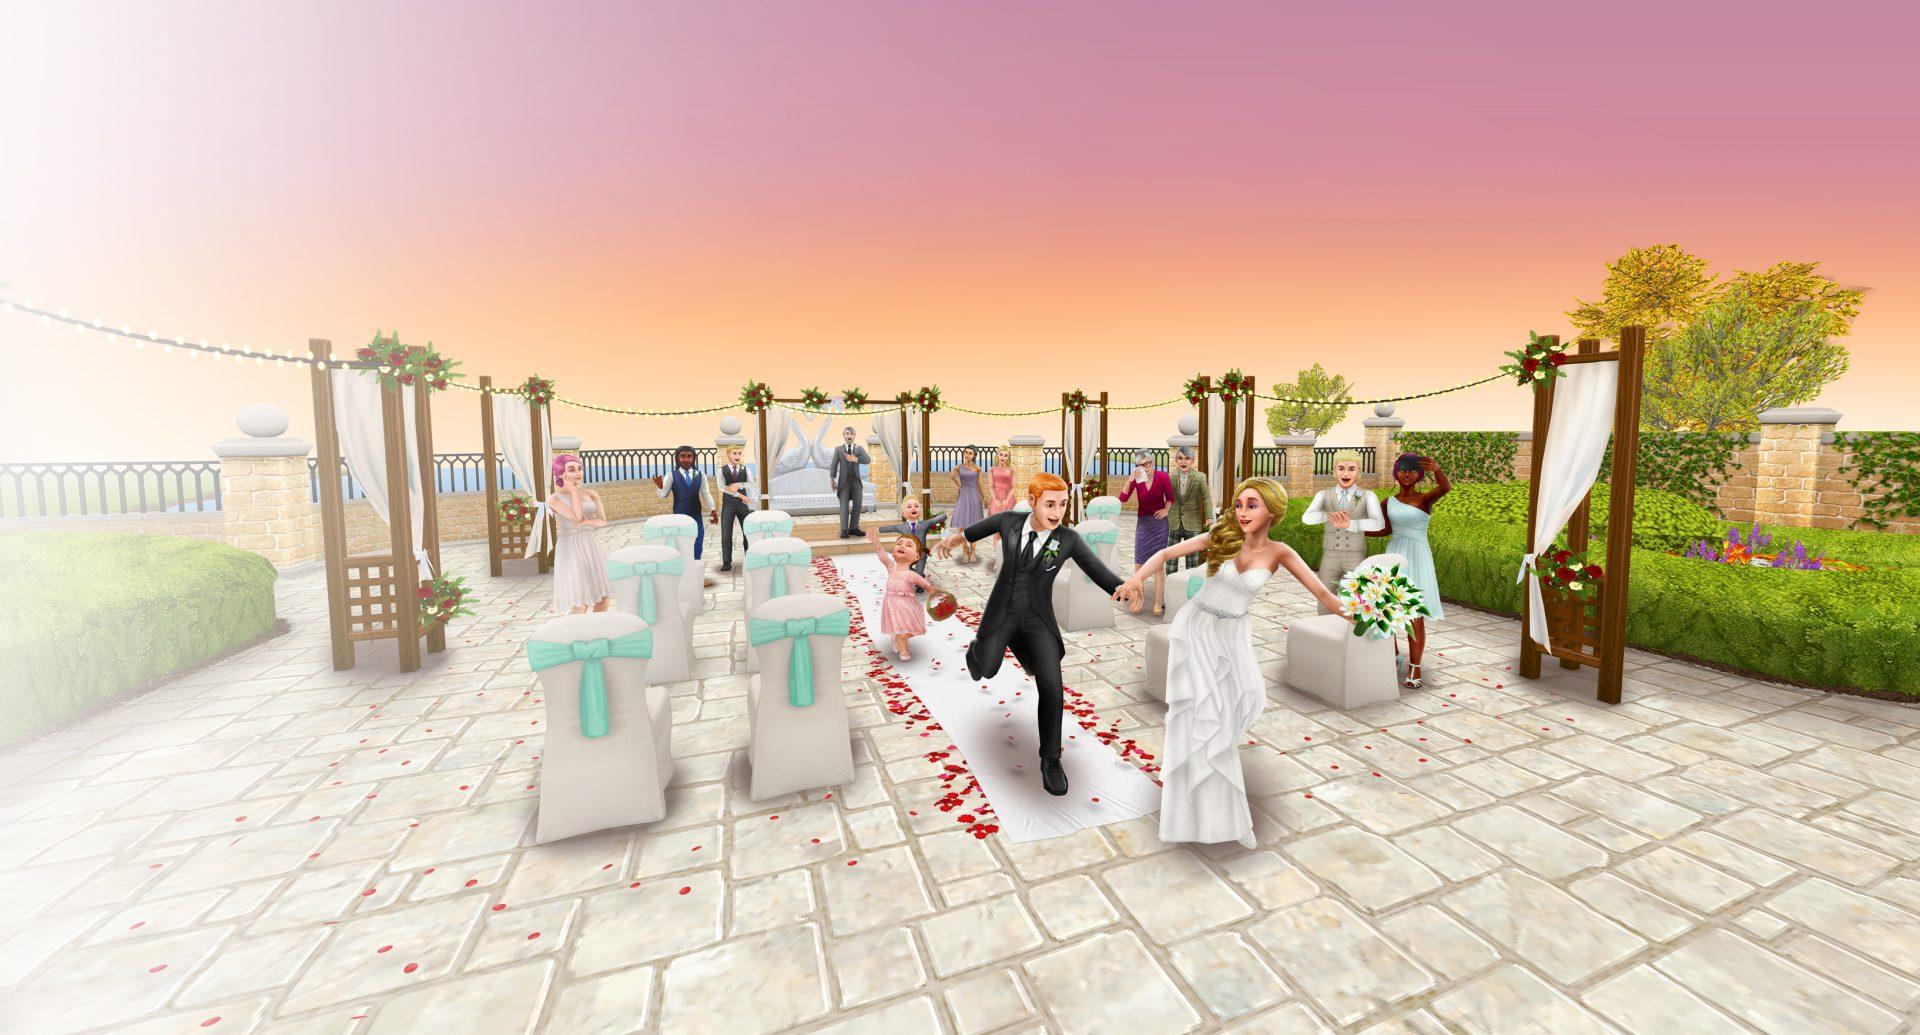 Игра де тский секс свадьба